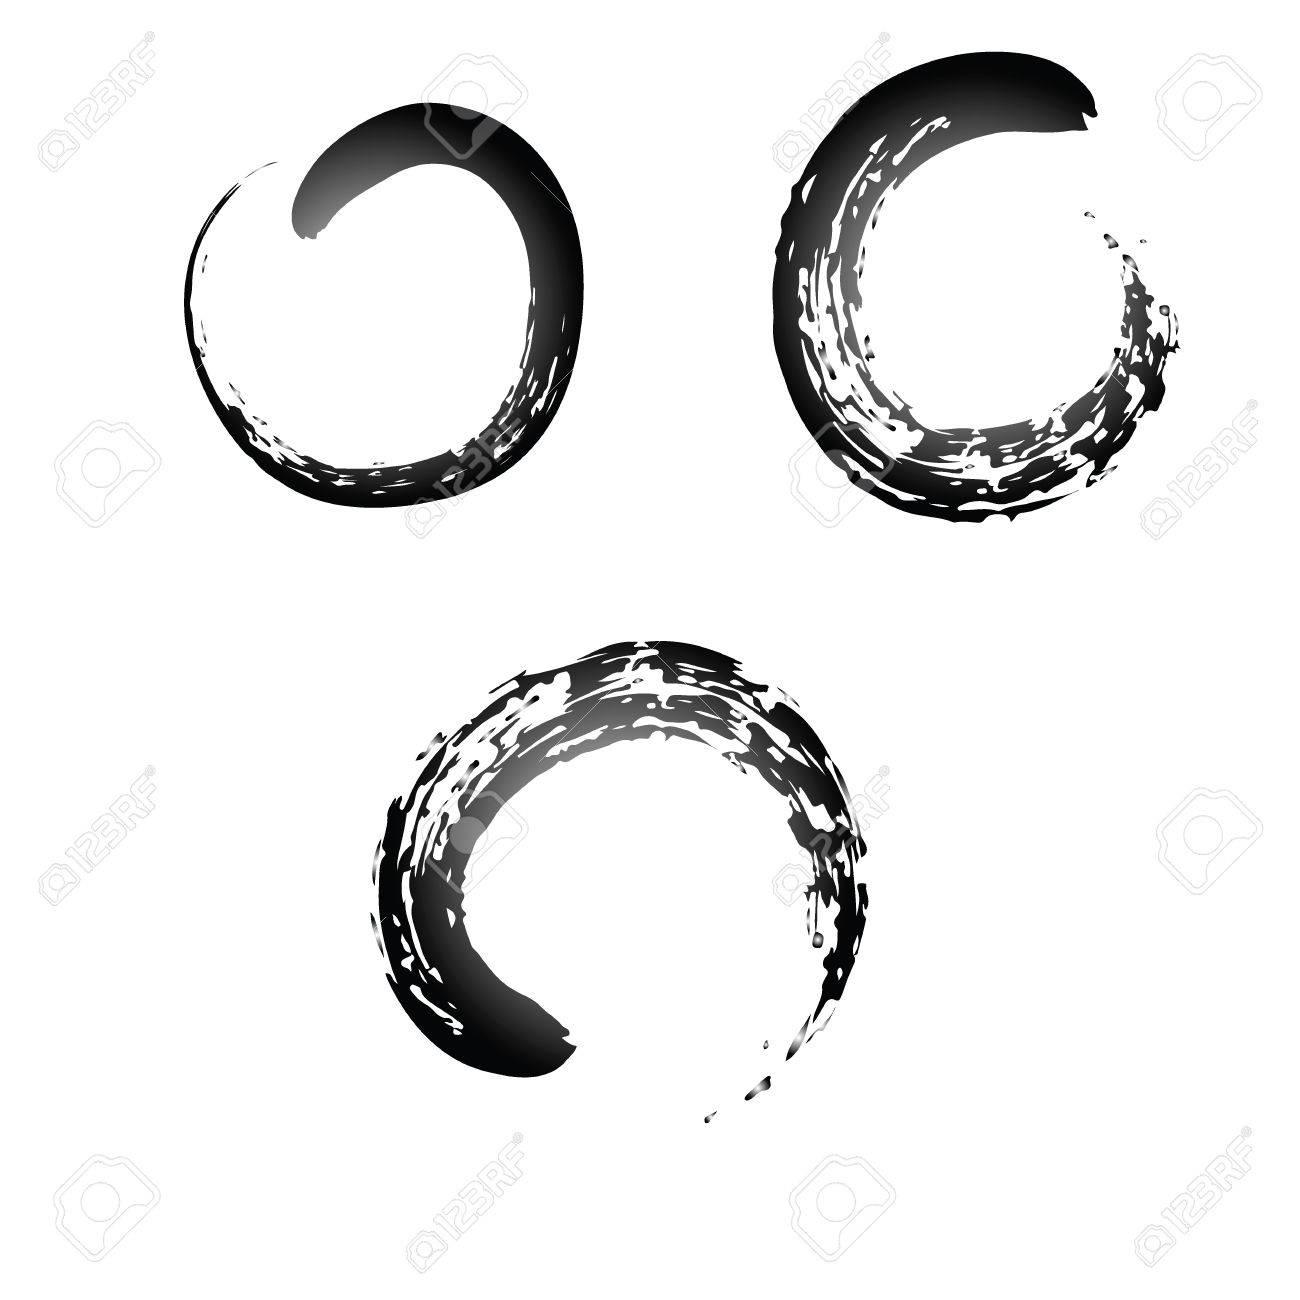 naked-japanese-symbol-for-black-amature-girl